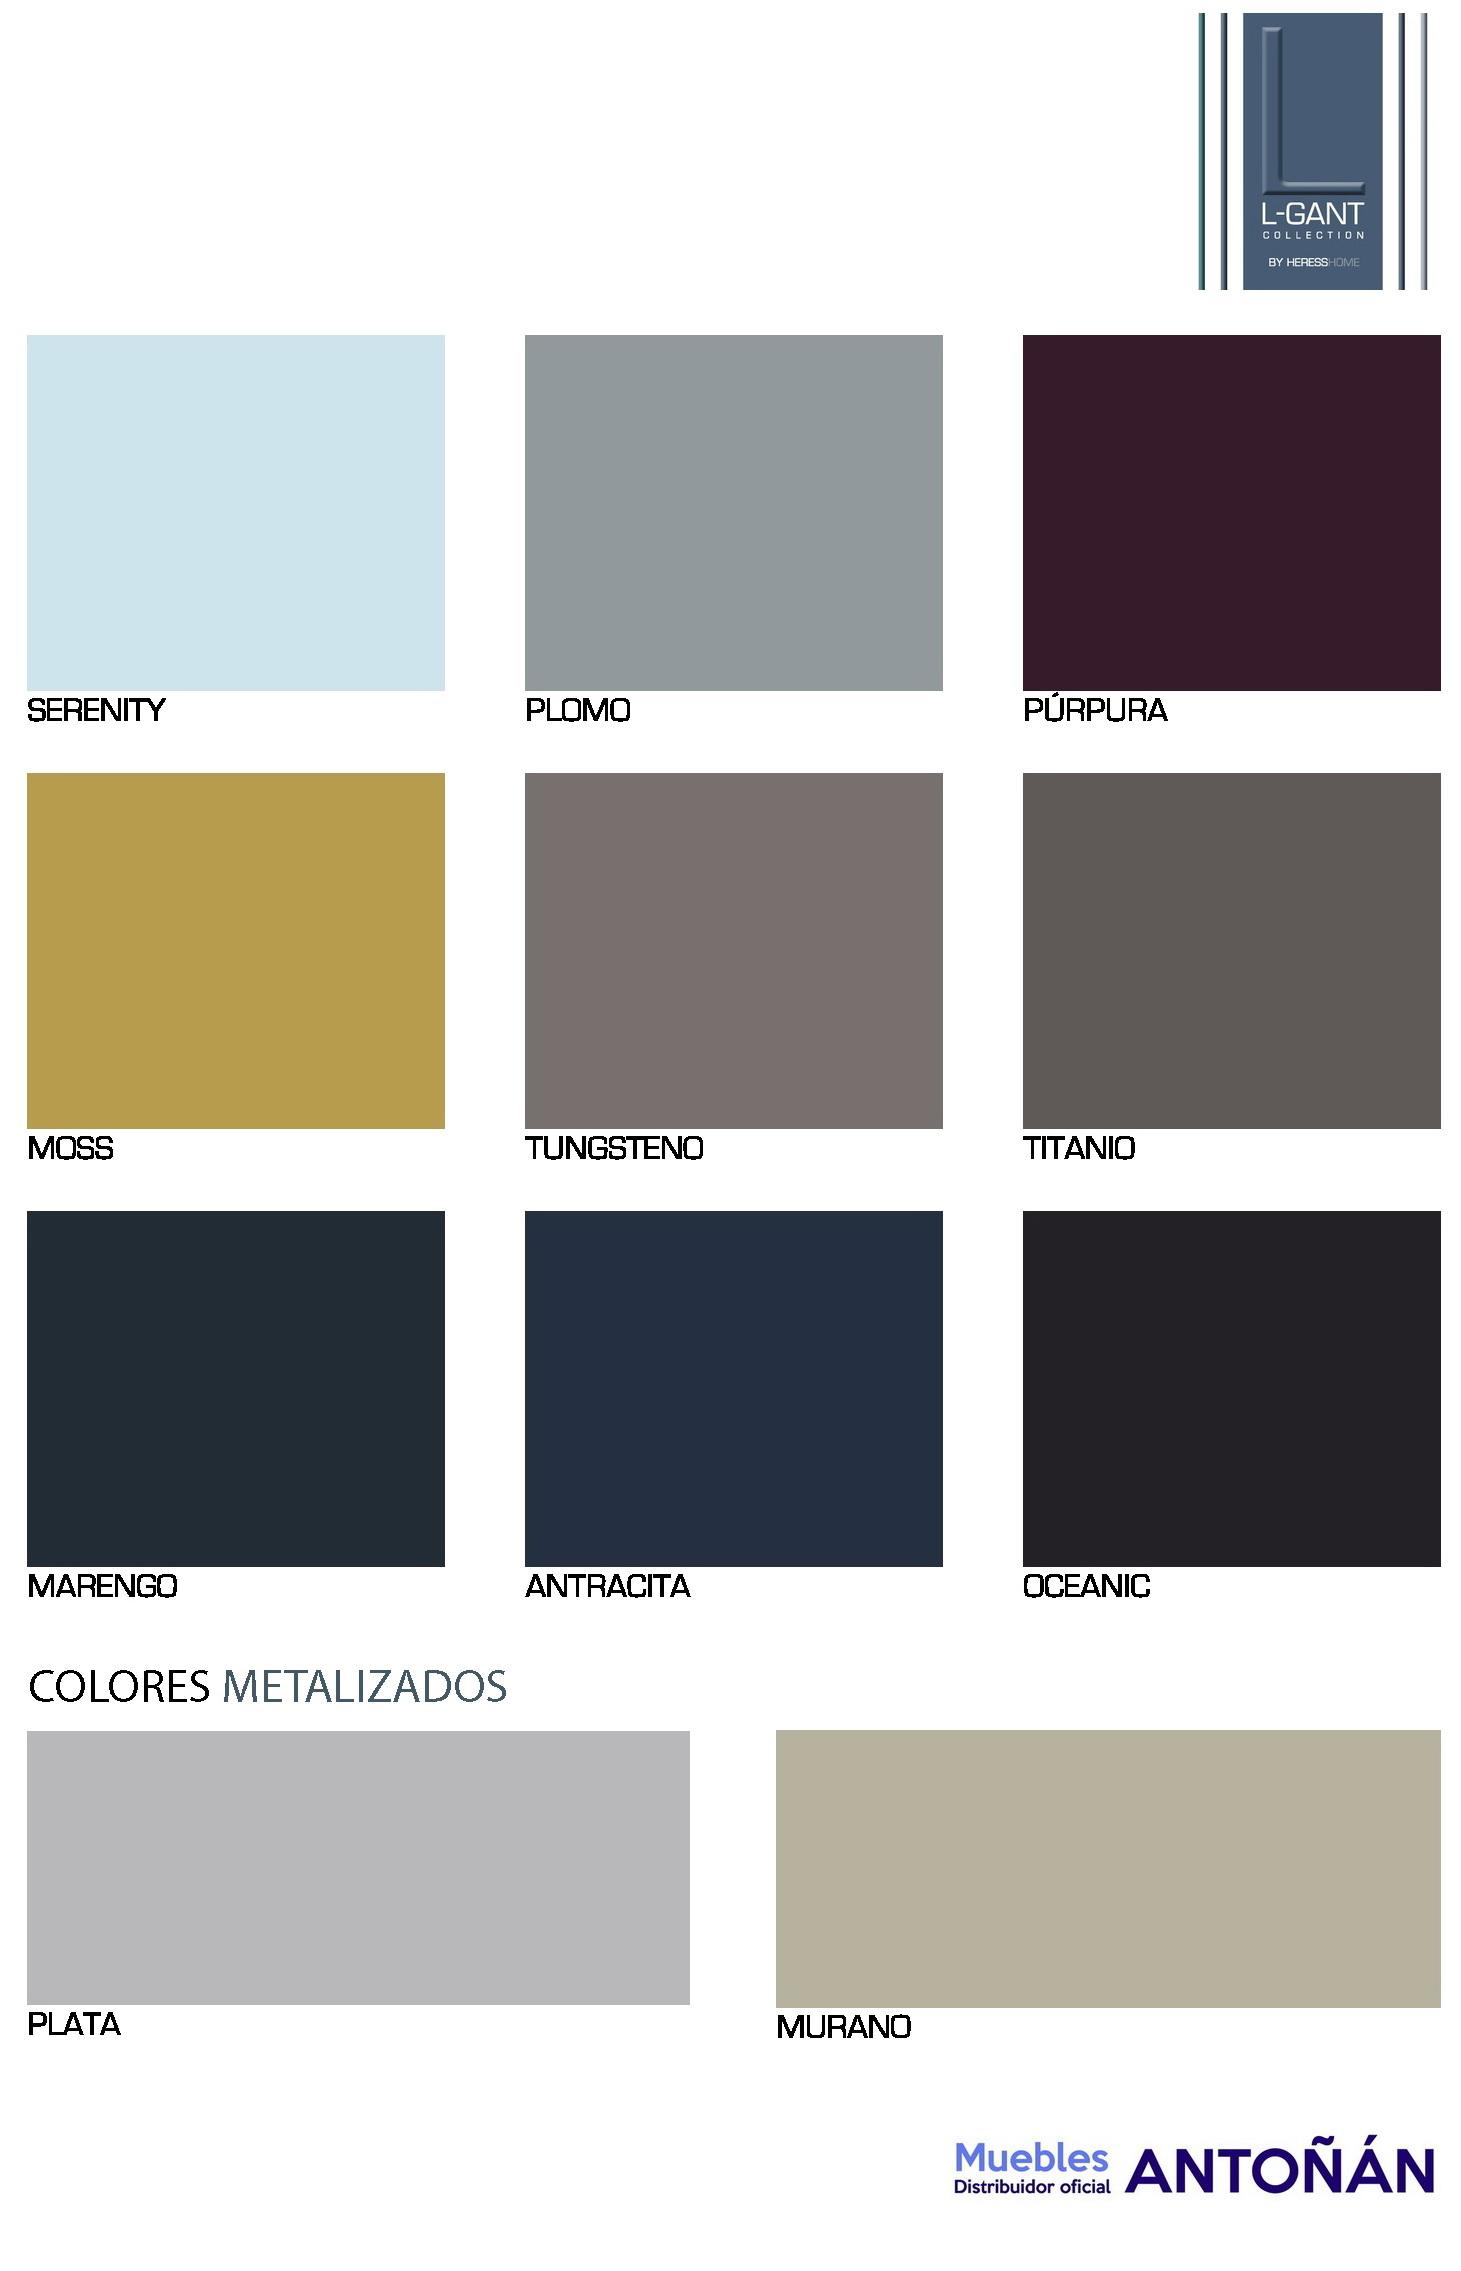 Colores 3 Muebles de Salón LGANT BY HERESS HOME en muebles antoñán® León